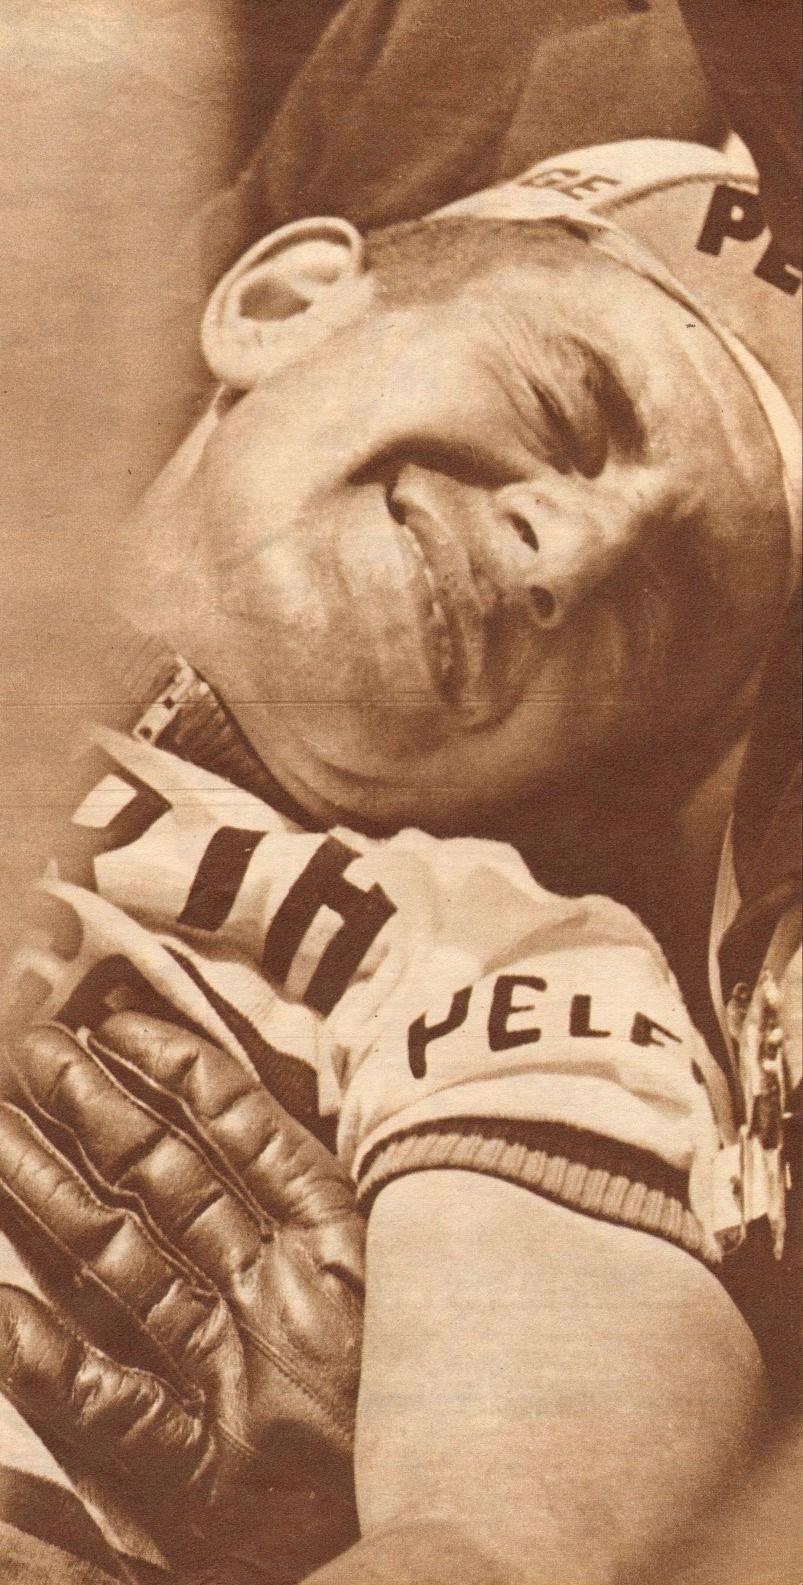 Tour de France 1965. 24-06-1965, 3^Tappa. Roubaix - Rouen. Georges Groussard (1937) cade e si frattura il femore: per lui il Tour 1965 è già finito [Miroir Sprint] (www.cyclingpassions.eu)